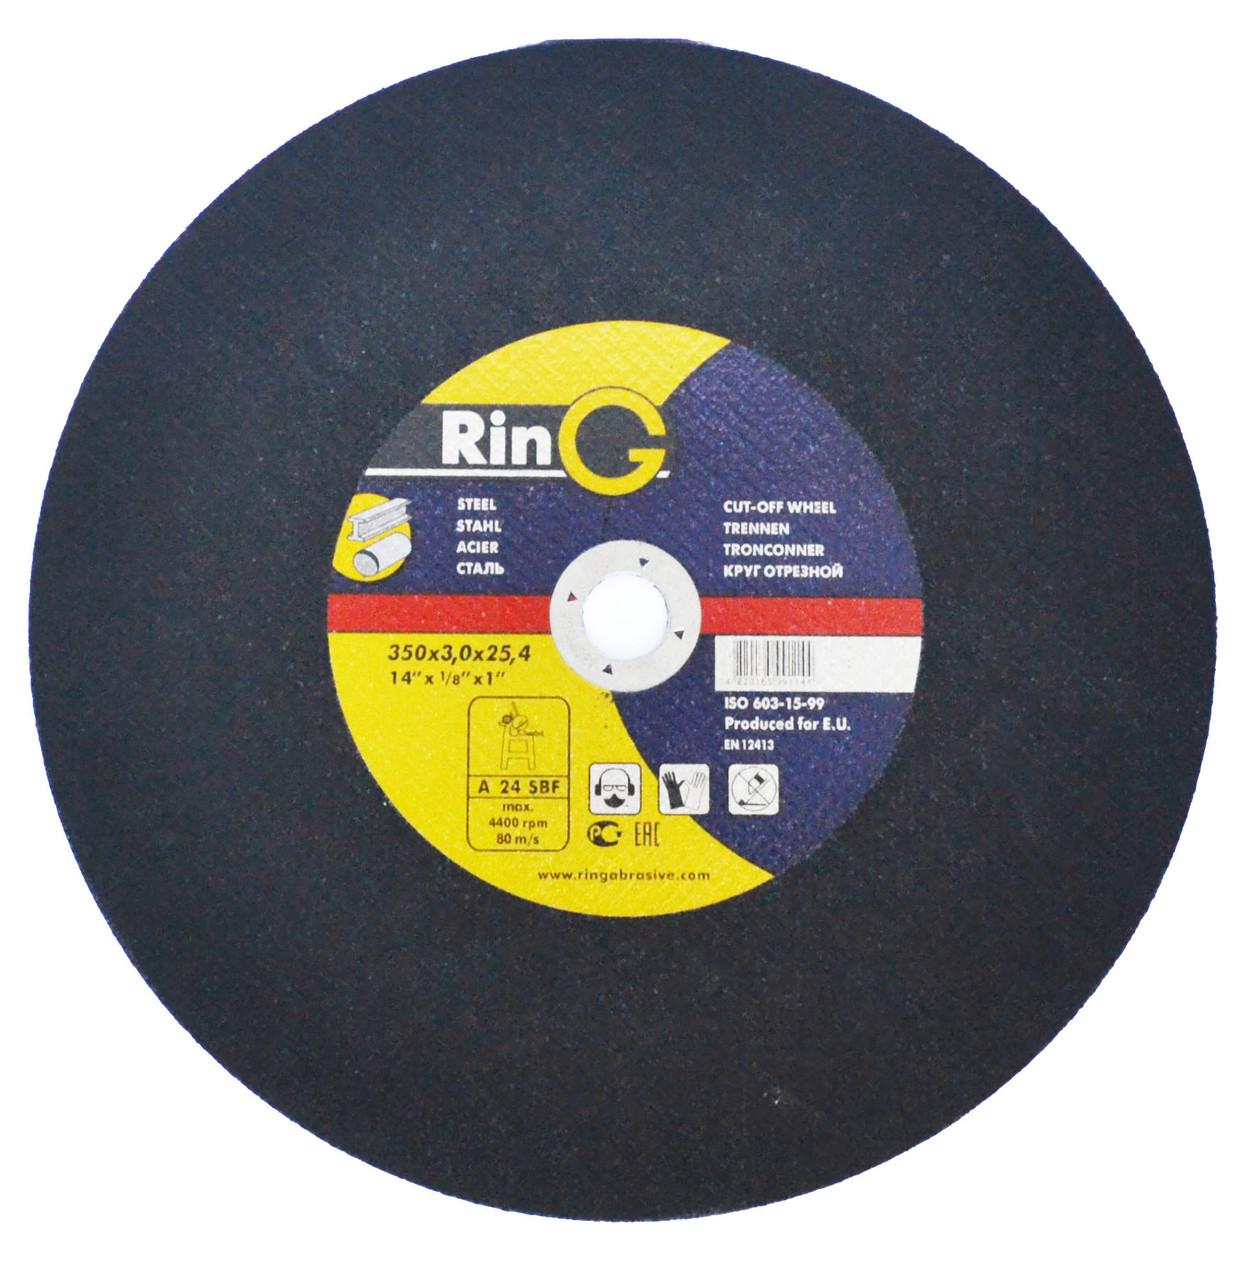 Круг отрезной по металлу Ring 350x3,0x25,4 для ручных шлифмашин